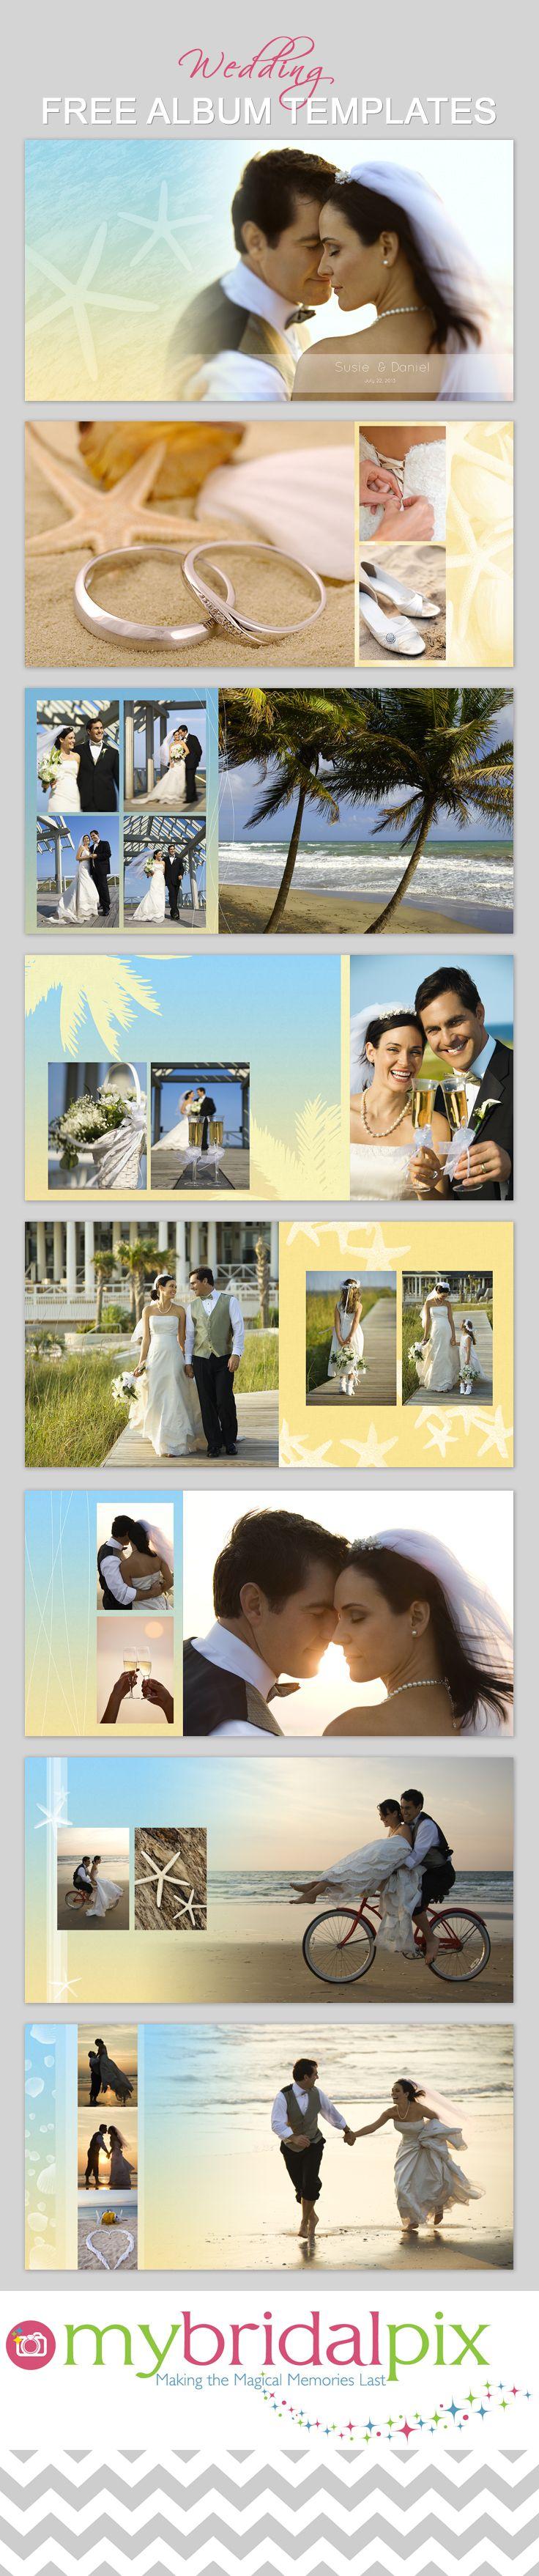 Inspirational do it yourself wedding album wedding inspirational do it yourself wedding album solutioingenieria Gallery